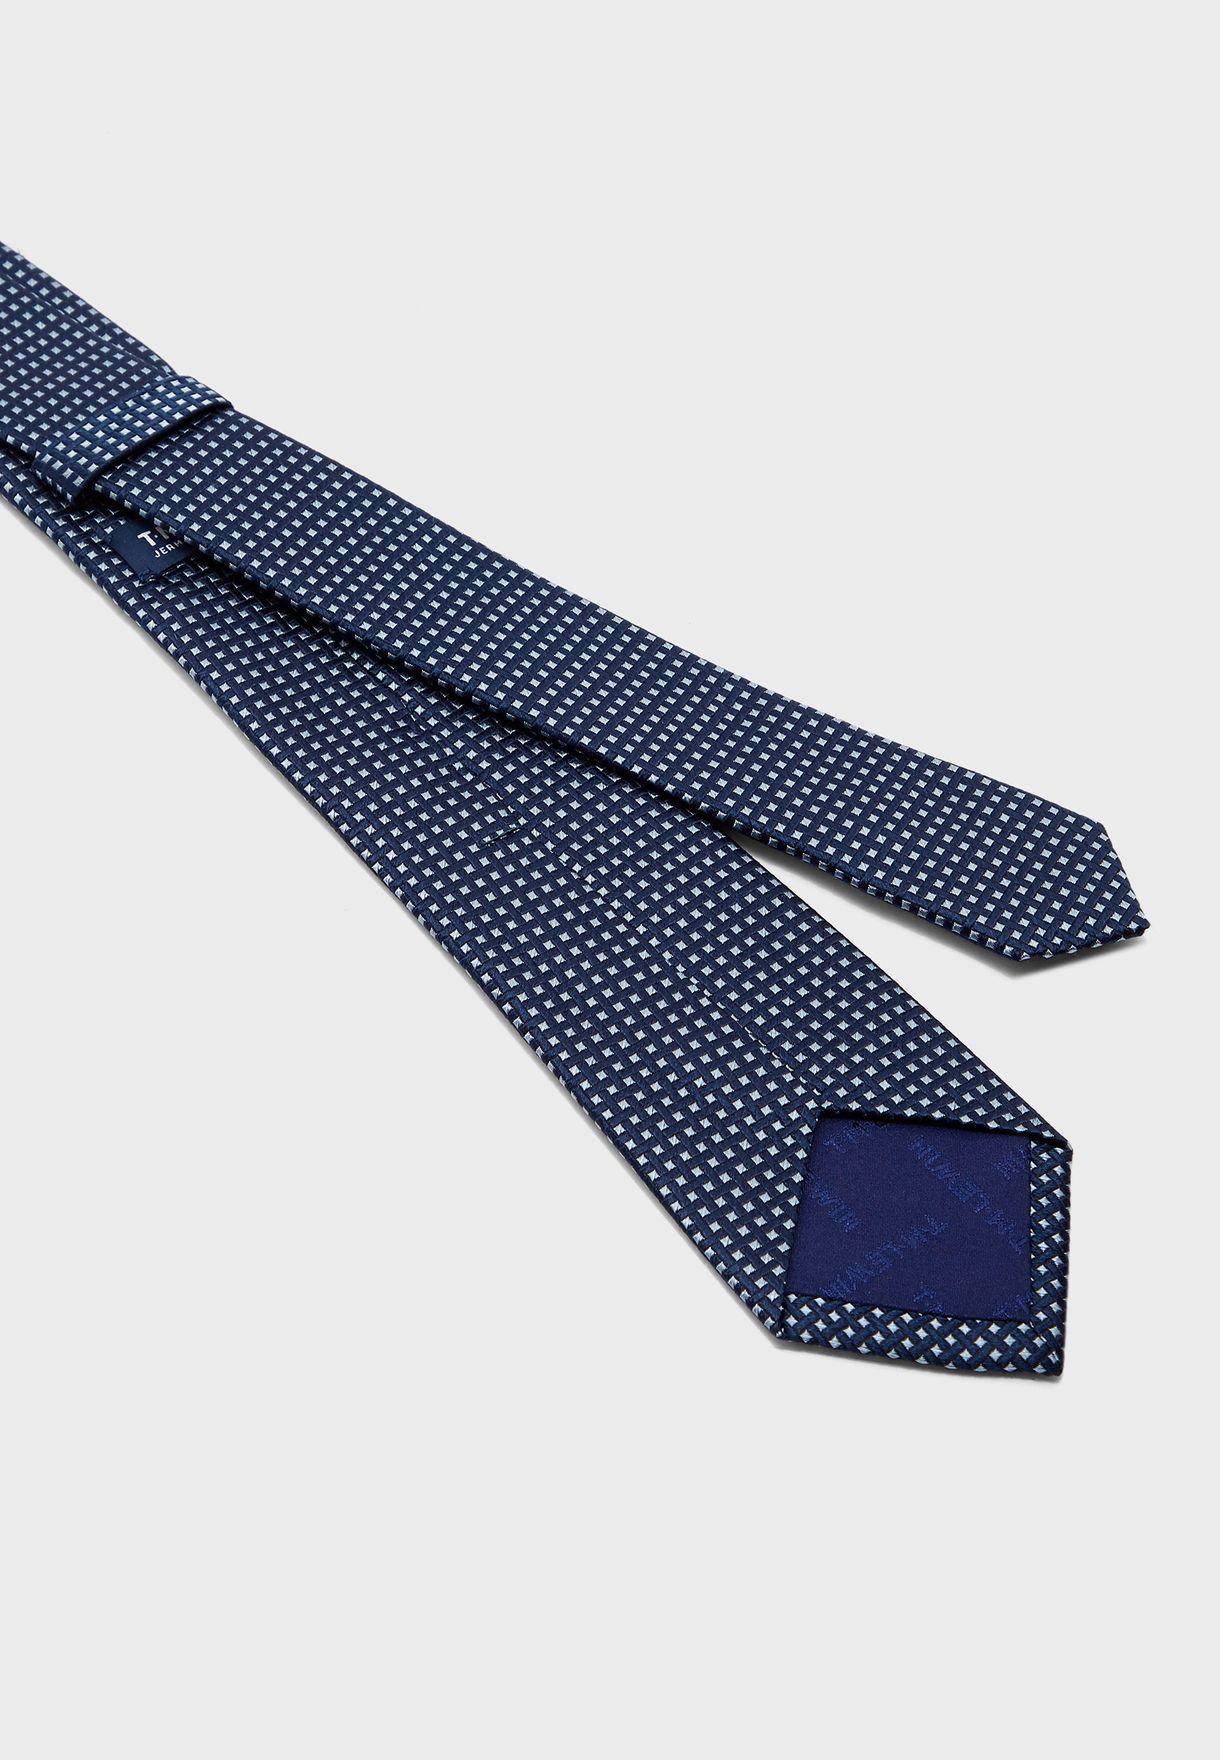 Jacquard Crosshatch Tie